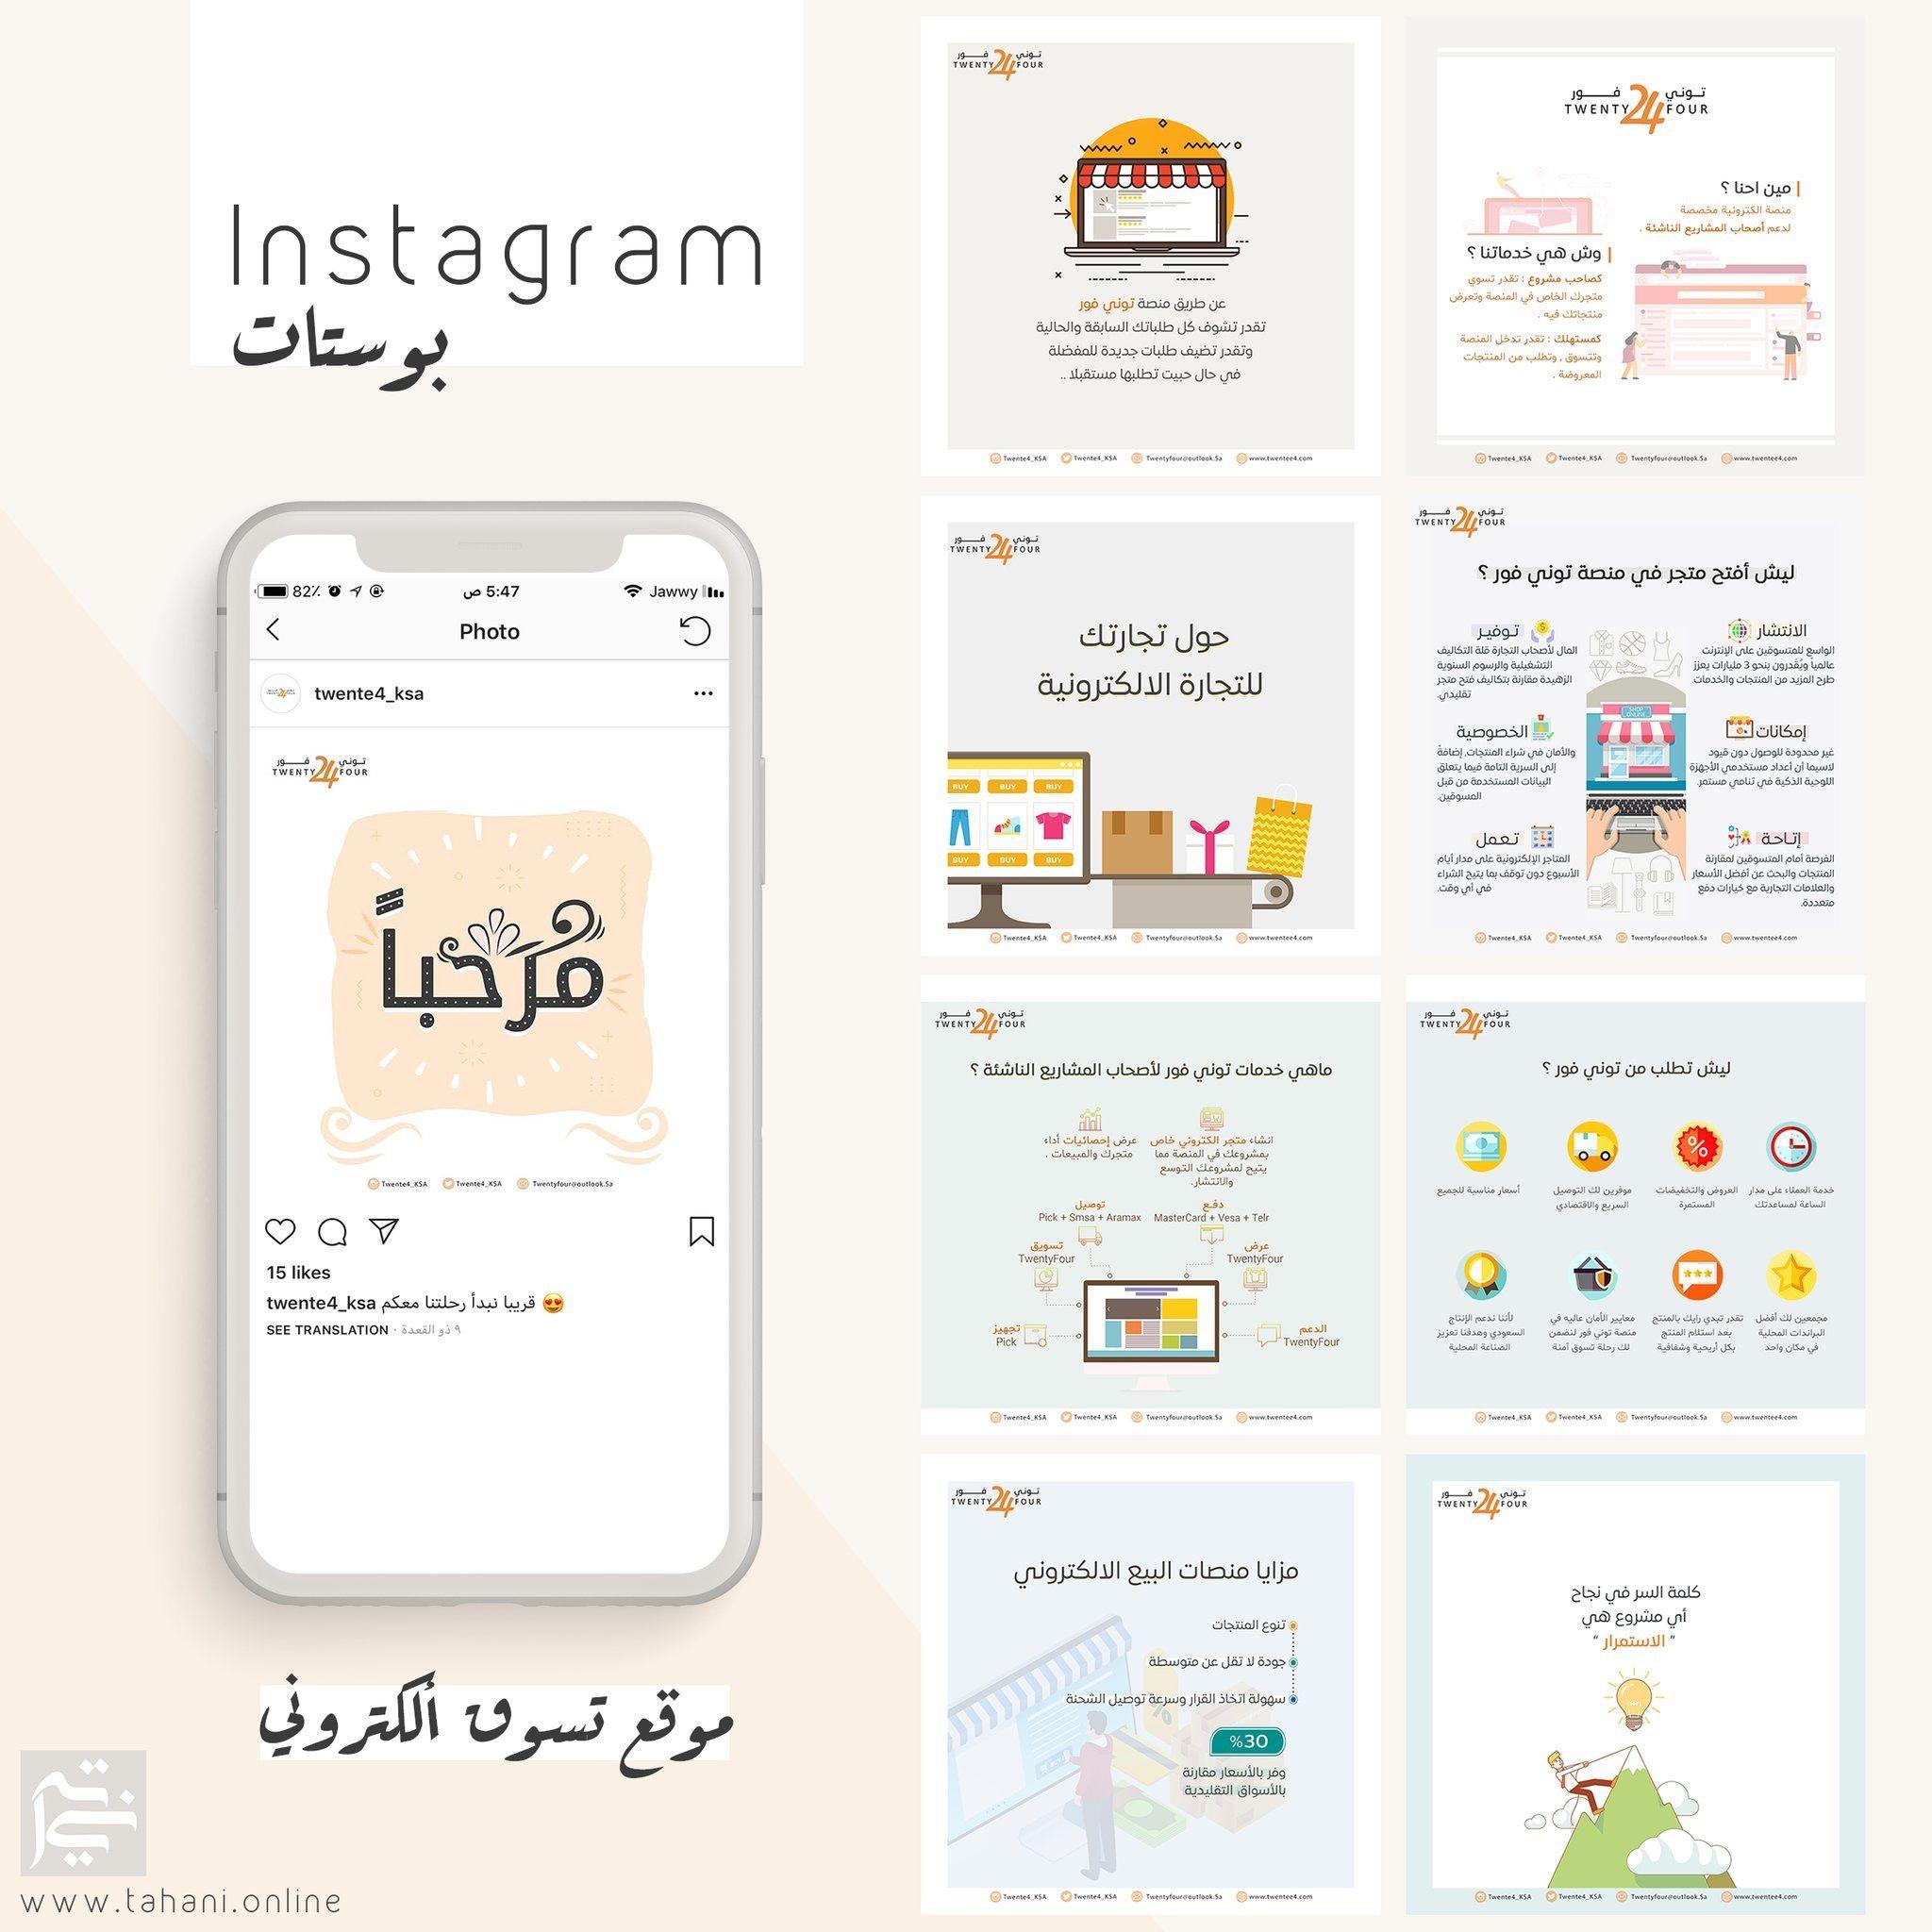 صور بوست بوستات انستقرام تصميم متجر موقع تسويق إنستقرام Instagram Logo Instagram Story Template Instagram